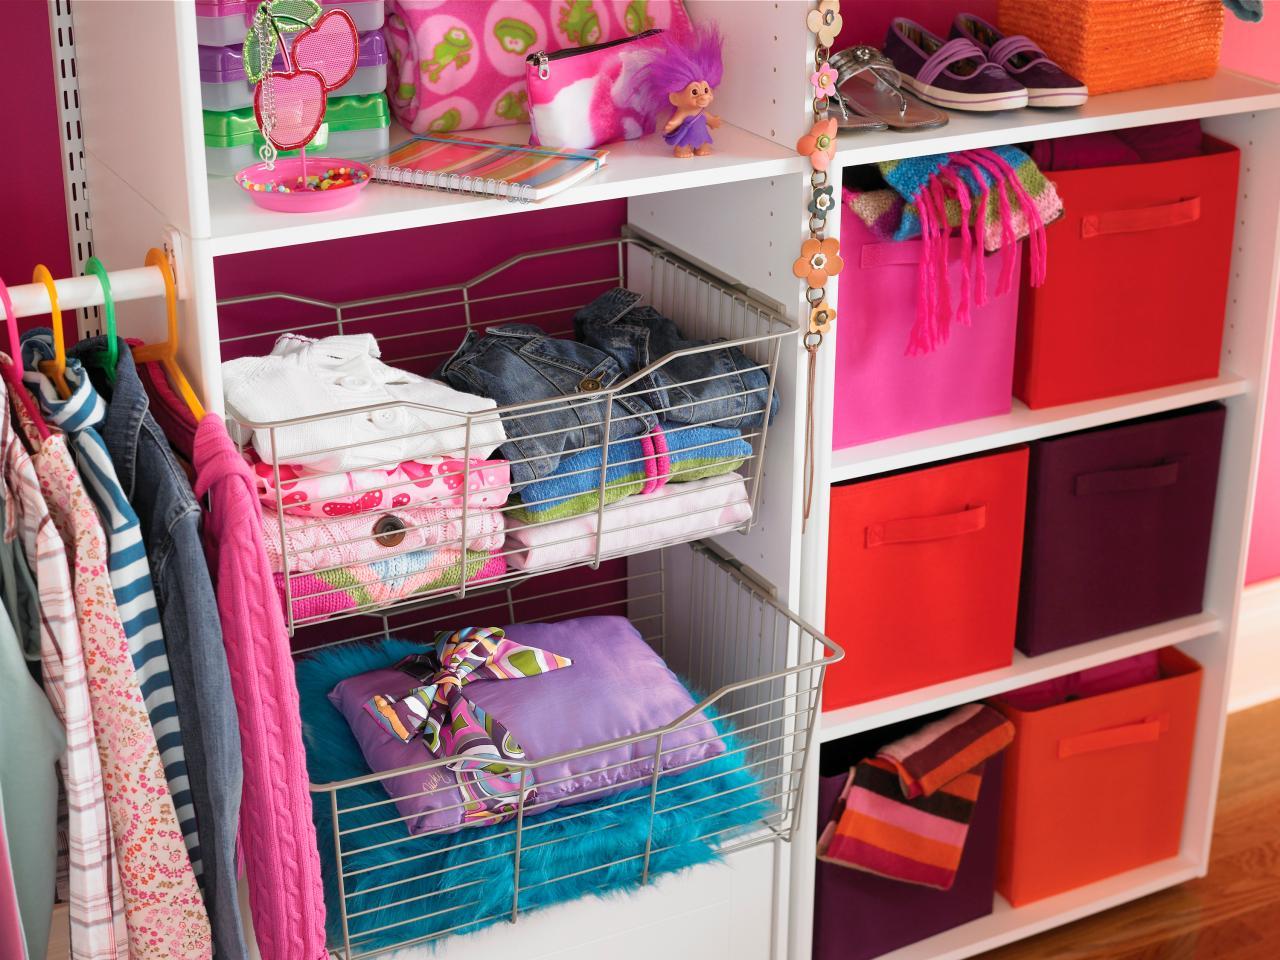 Rangement walk in garde robe unit murale armoire - Organiser sa maison rangement ...